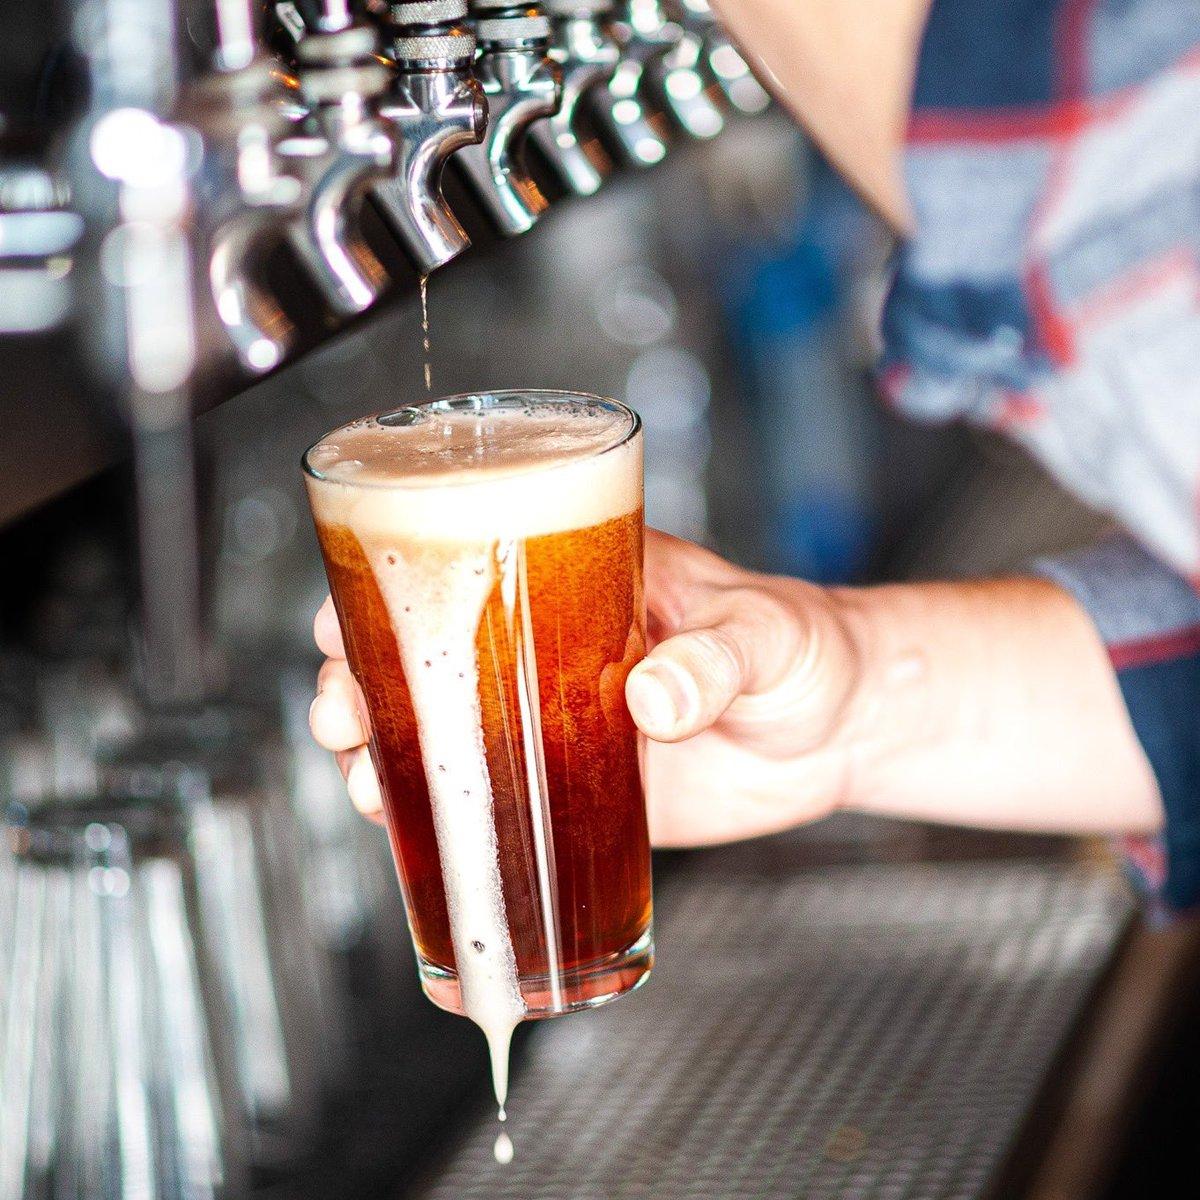 RT #NapaPalisadesSaloon #Napa #HappyHour 🍻  Beer and Balls are BACK. 2 delicious Reuben Balls and your choice of Napa Palisades' #Beer every weekday from 3-6. Order now at  #BeerGuysInWineCountry #2Balls1Beer